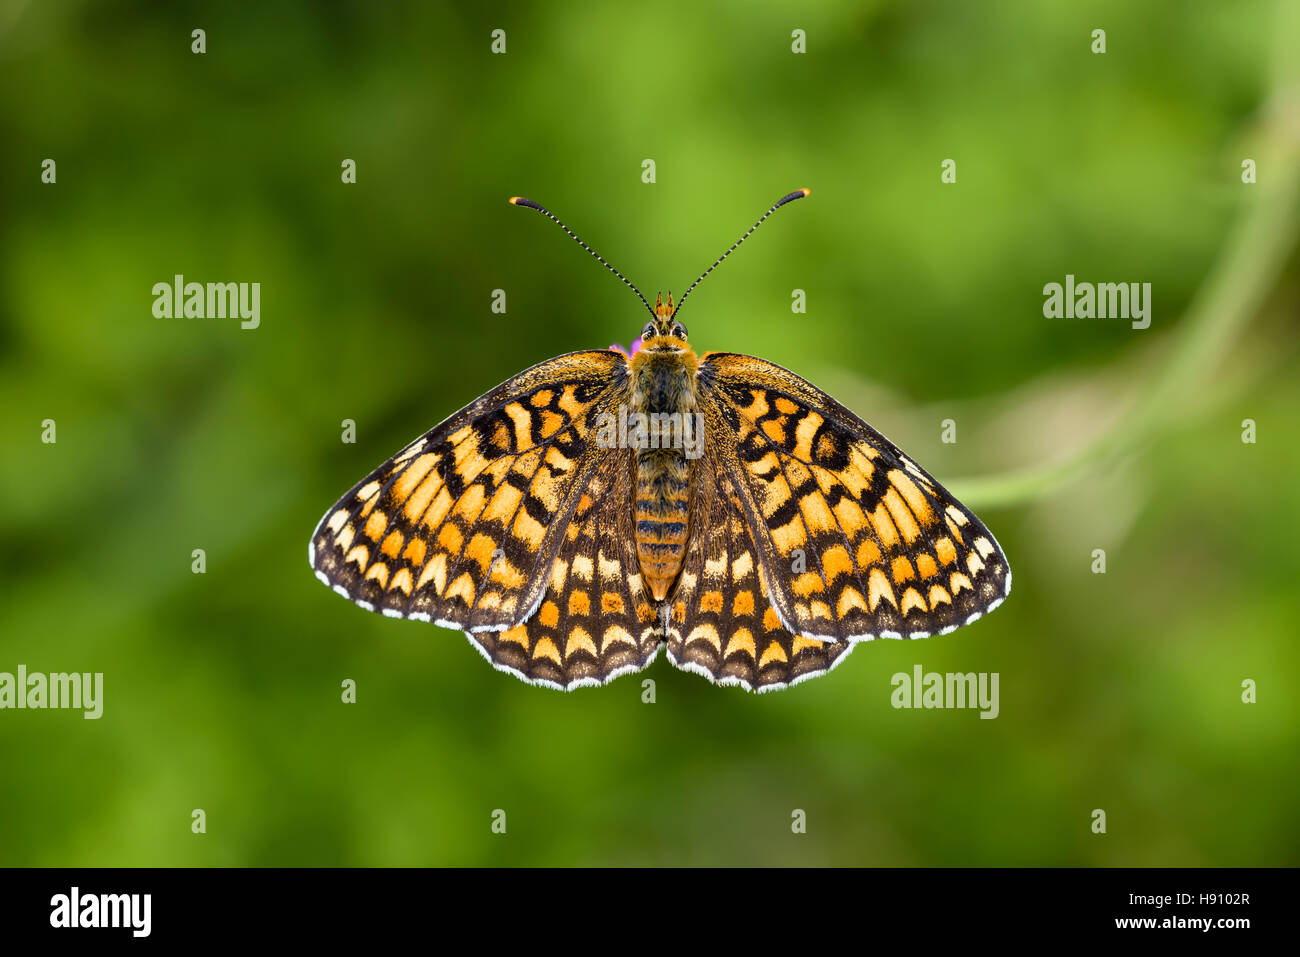 Flockenblumen Scheckenfalter, Melitaea Phoebe, Flockenblume Fritillary Butterfly Stockbild